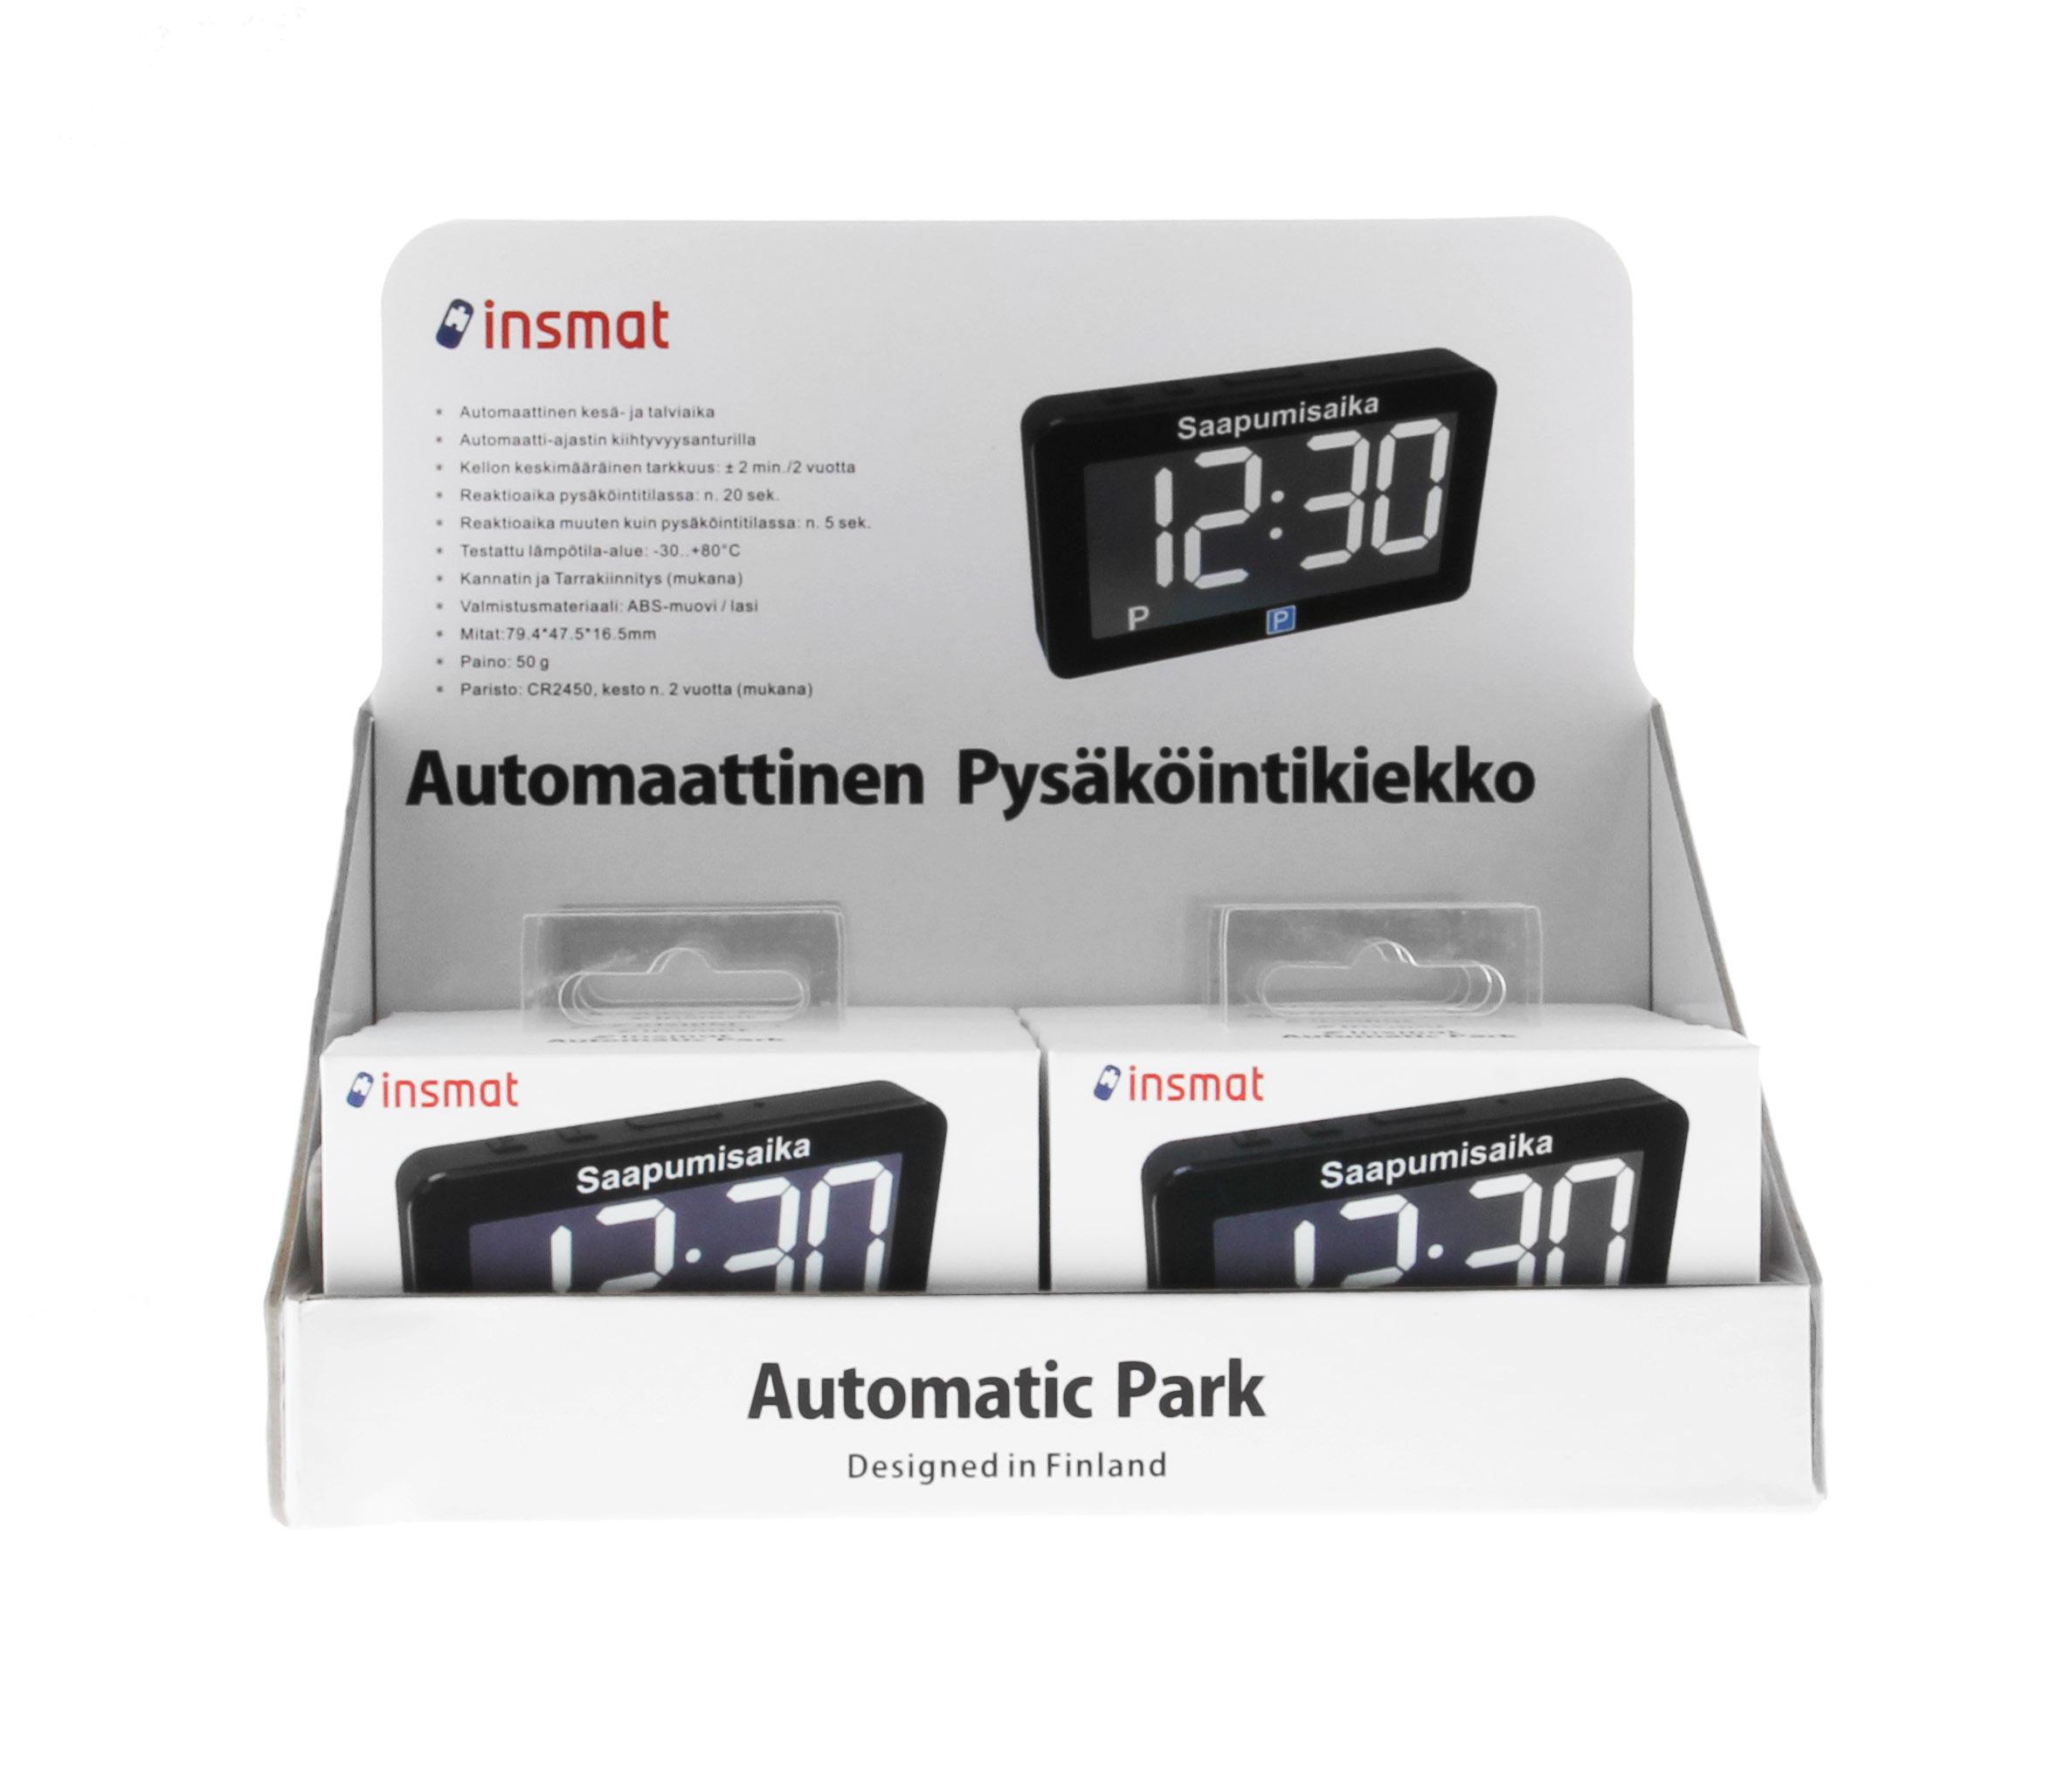 INSMAT AUTOMATIC PARK TABLE STAND - Automaattinen Parkkikiekko - Insmat 8db1c8d130